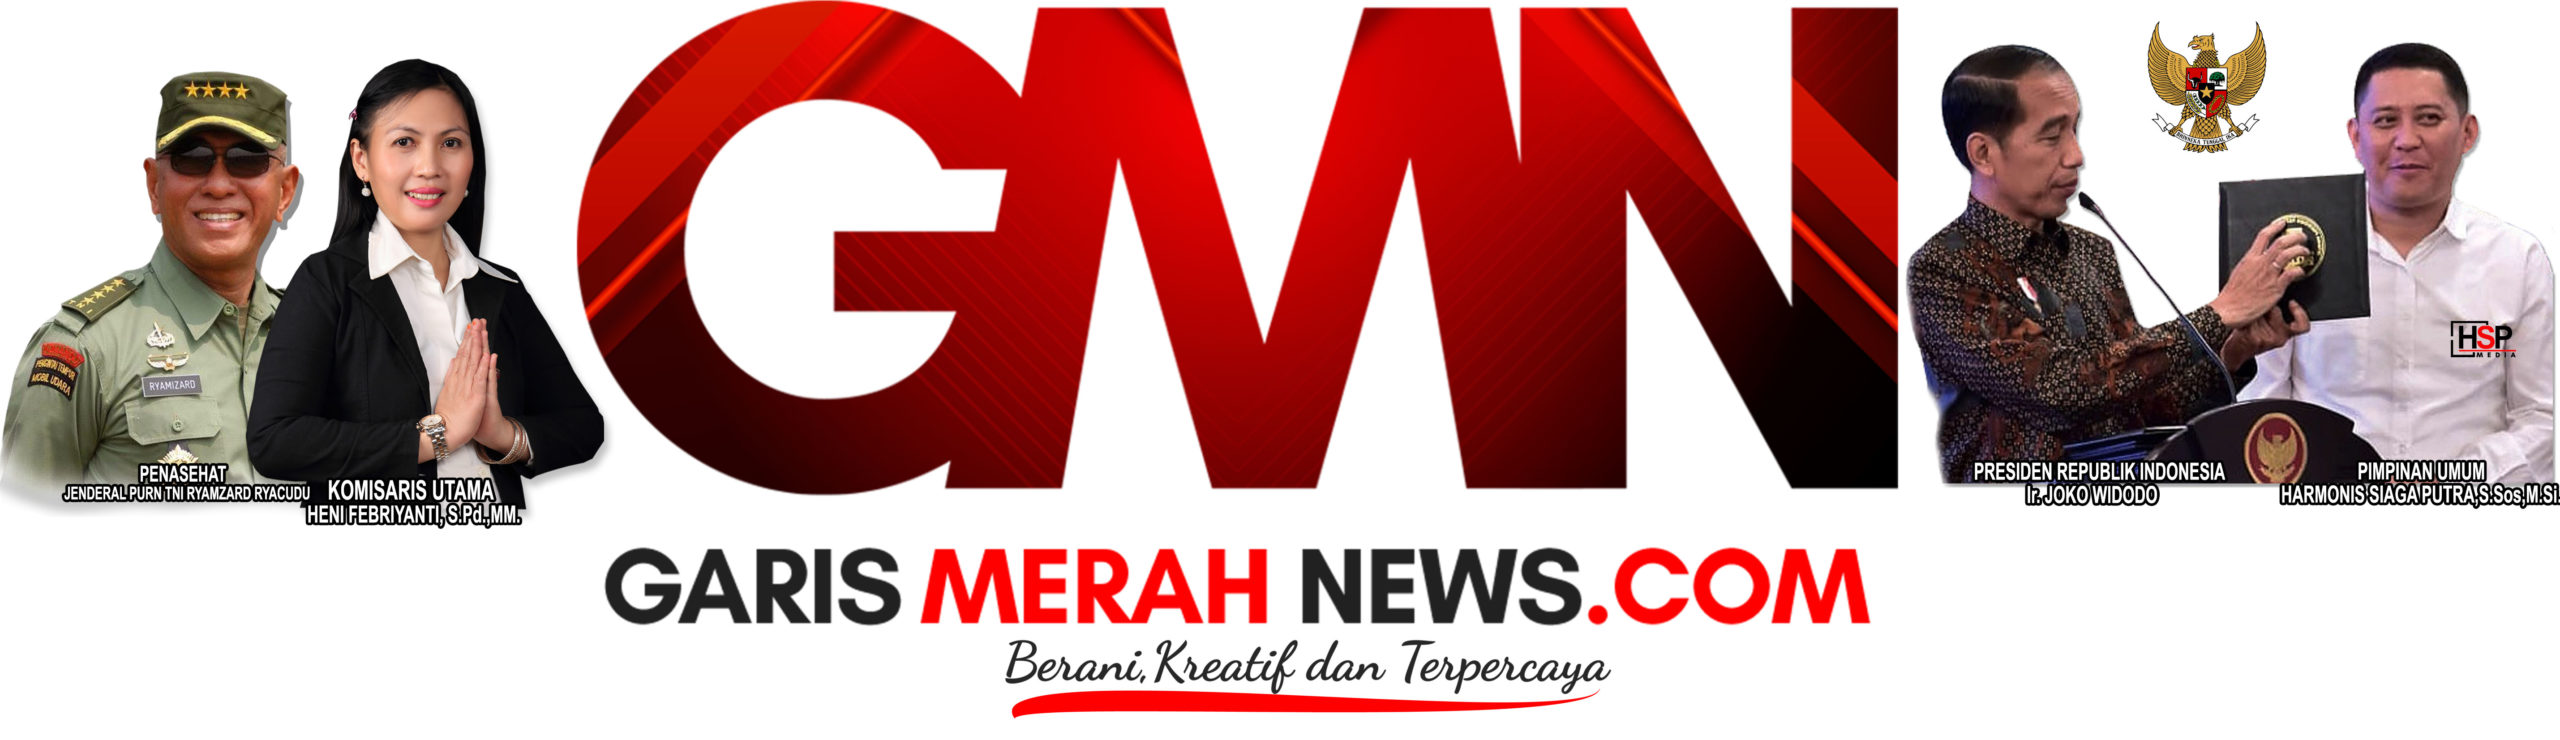 Garis Merah News